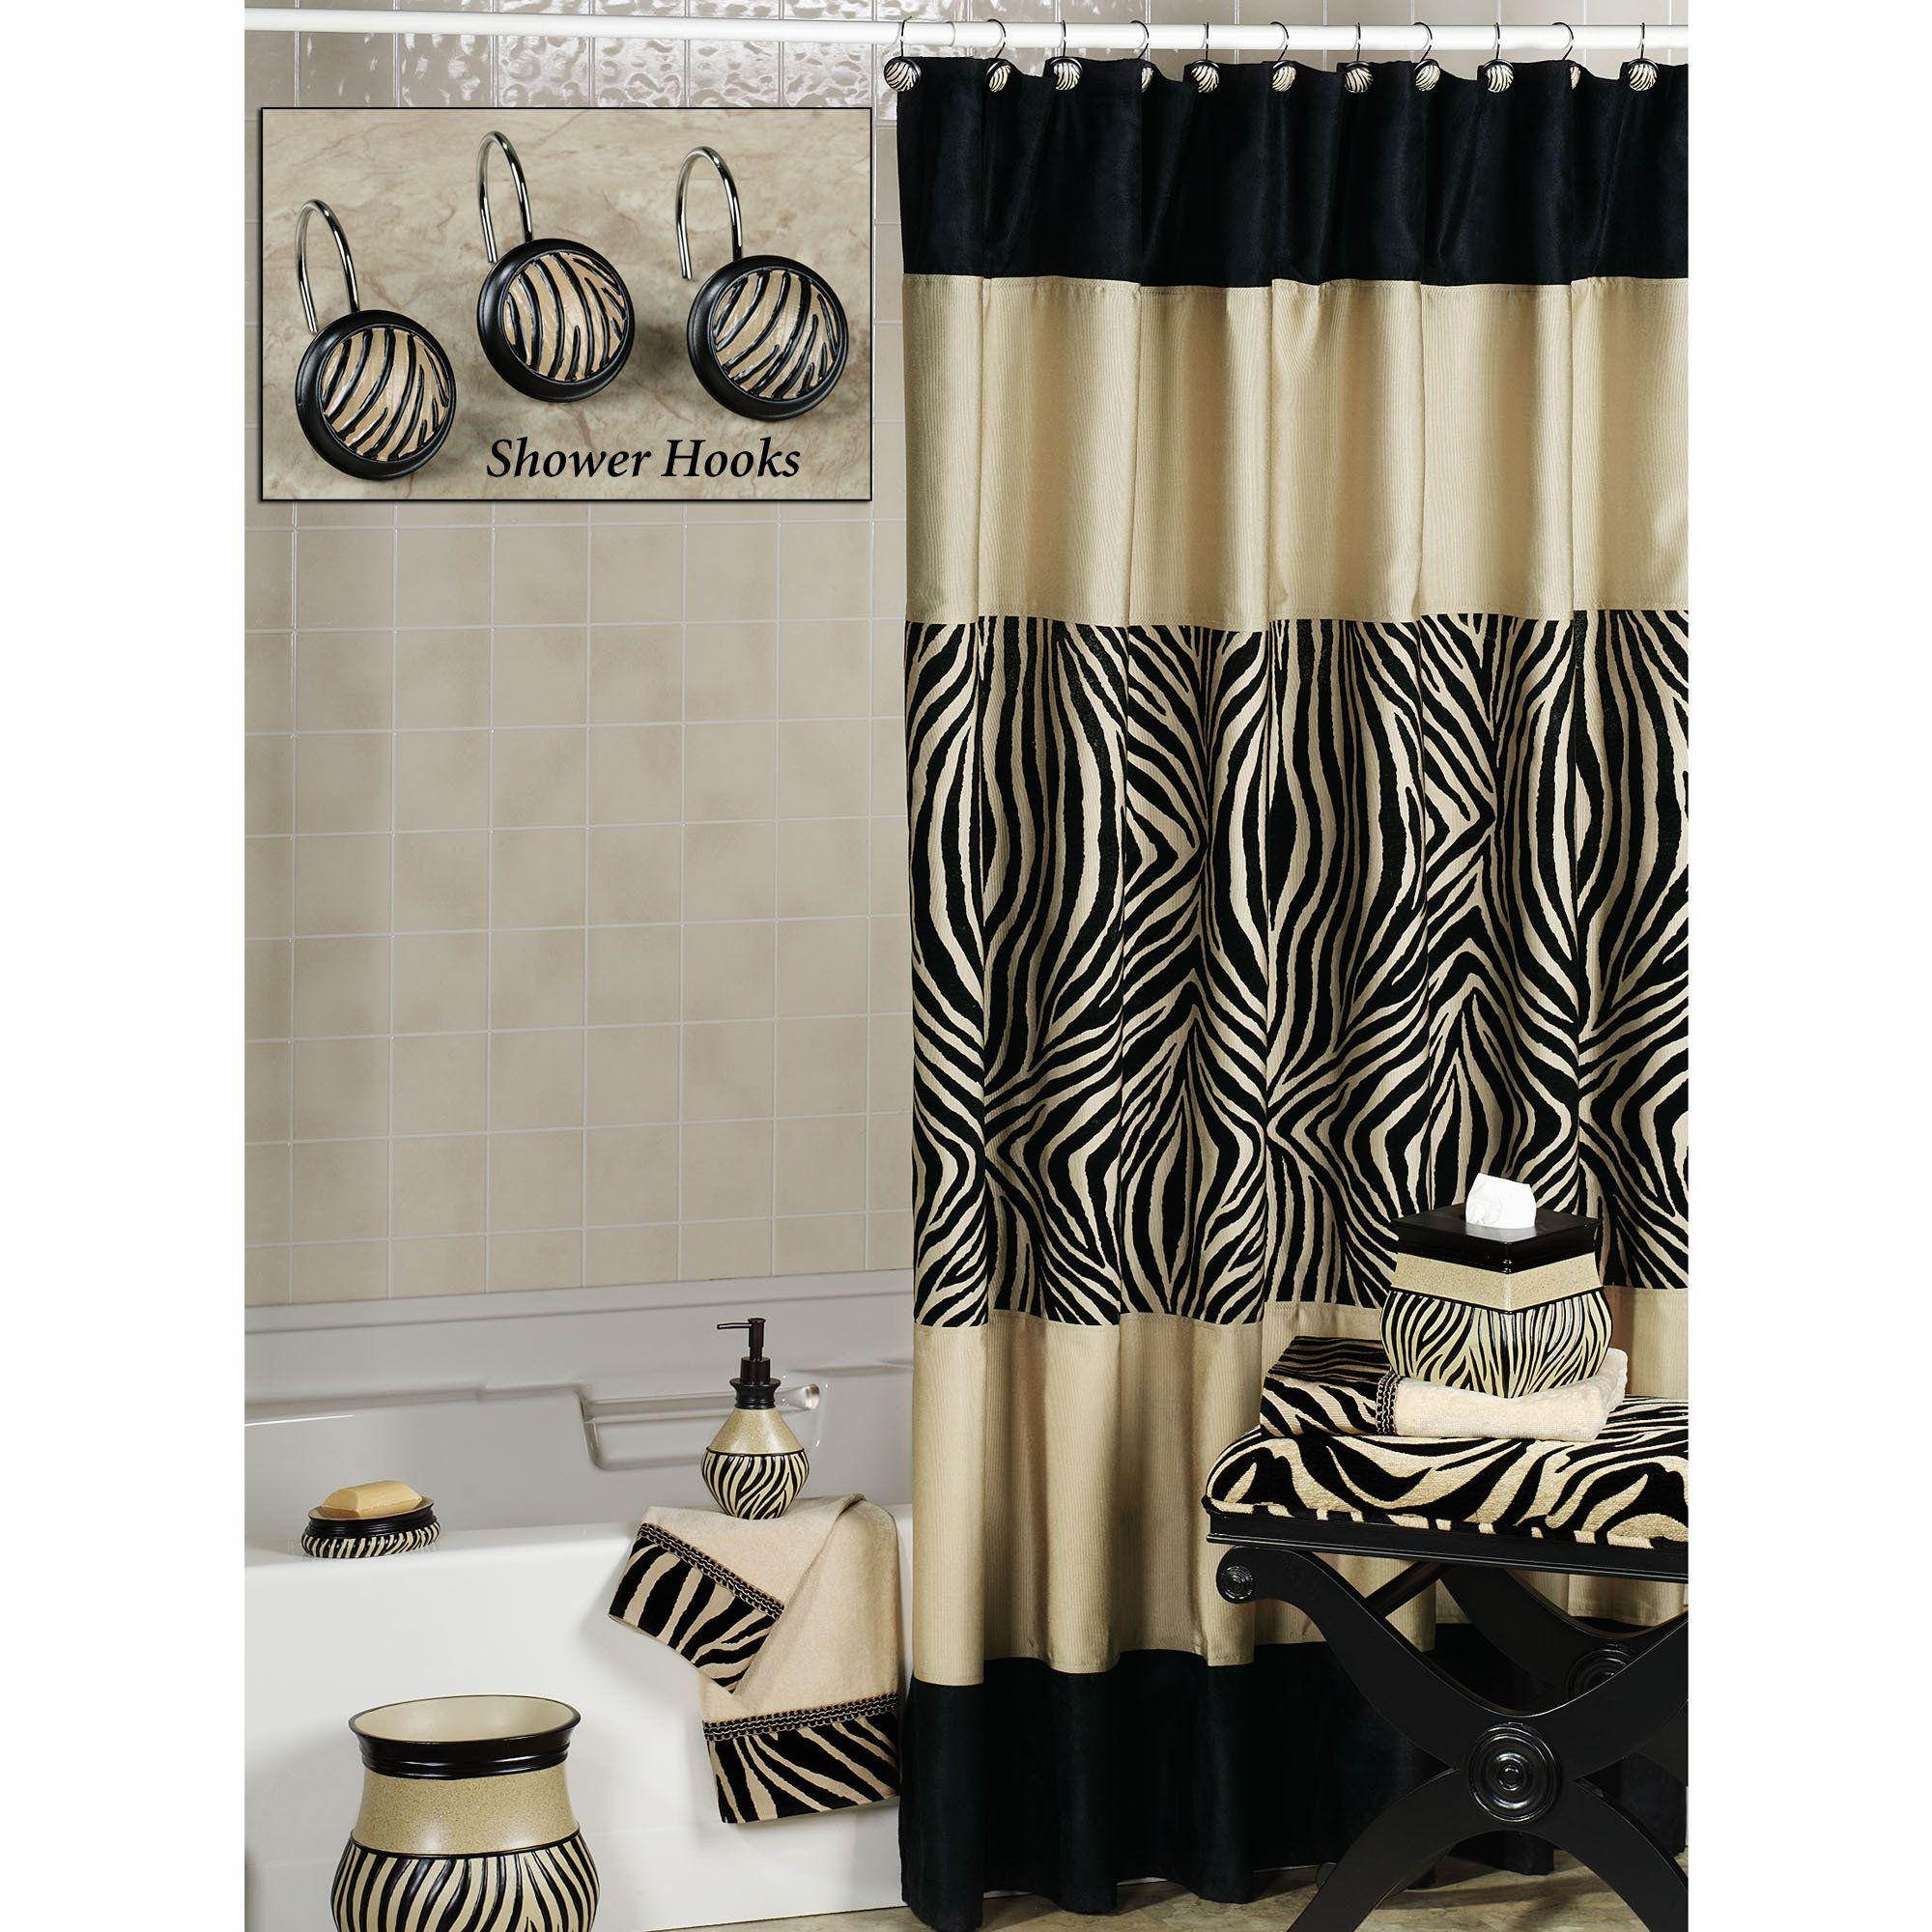 zuma zebra shower curtain and hooks | shower curtain hooks, zebra